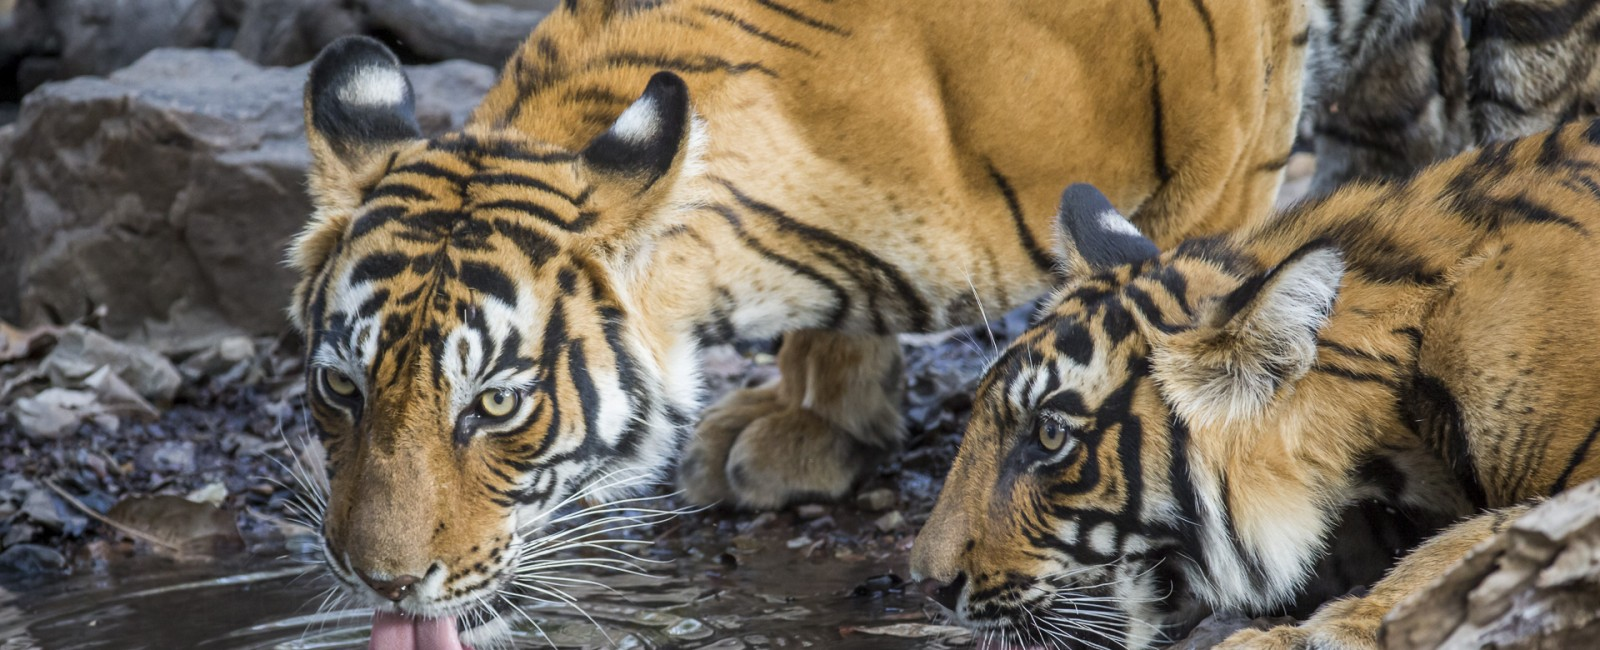 Permalink to The Tiger Safari: Day 6